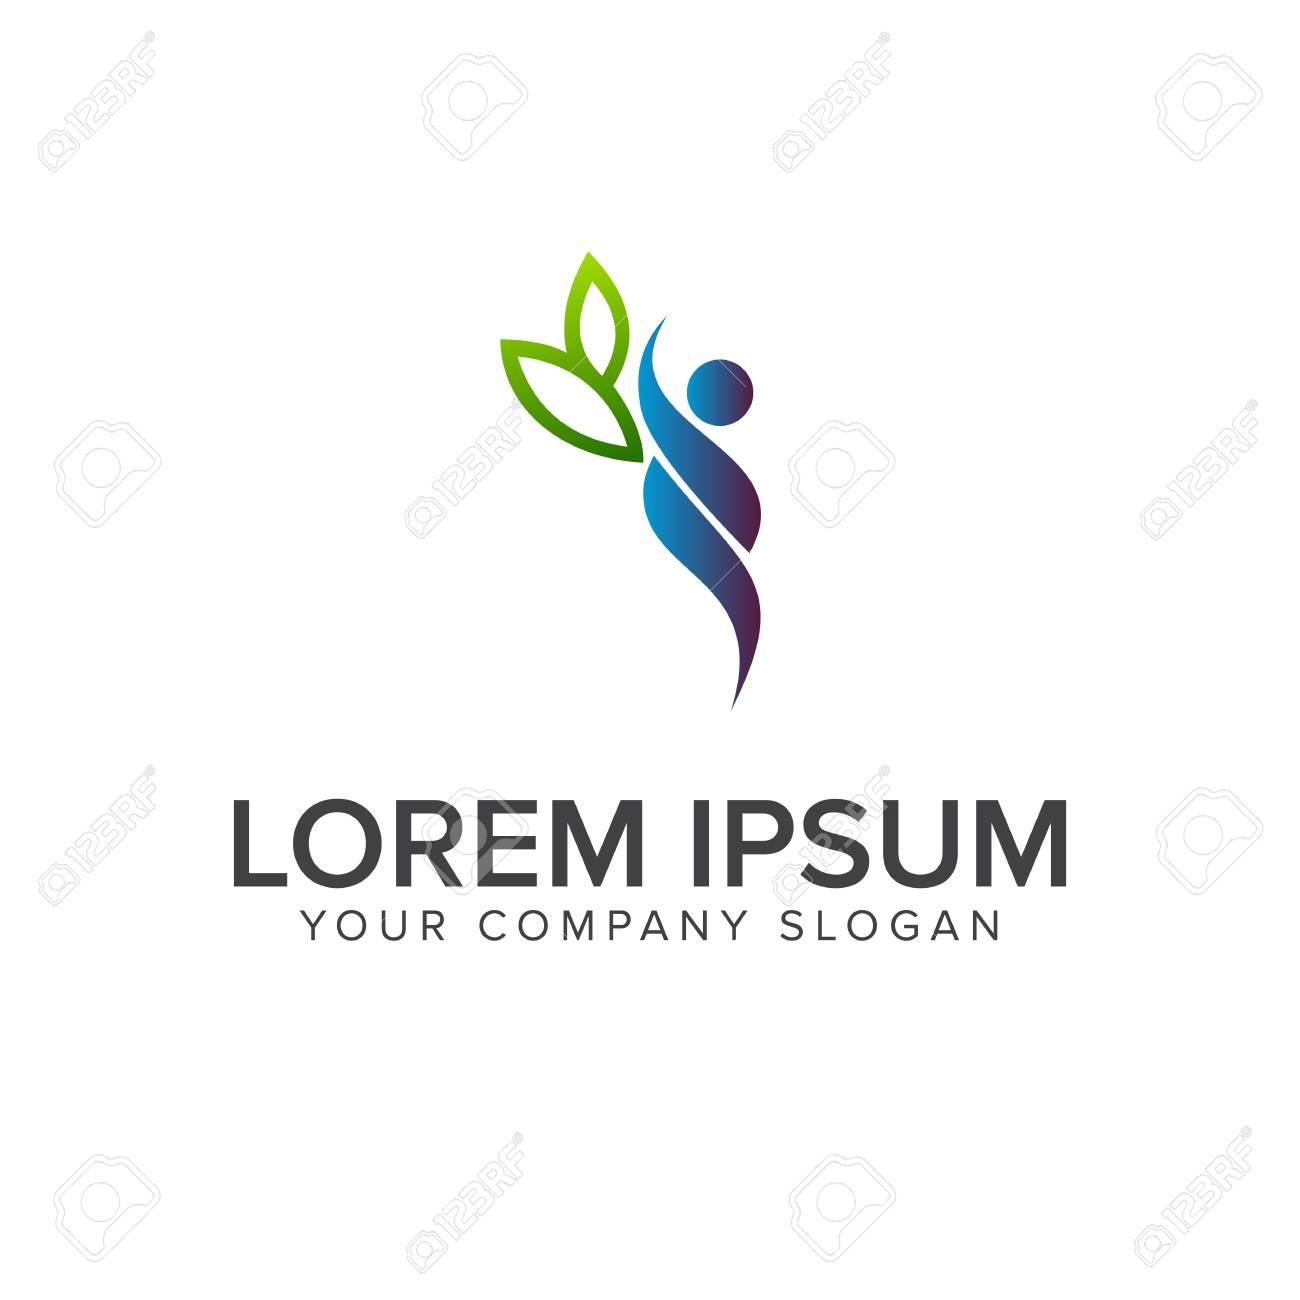 people leaf logo design concept template - 83305362